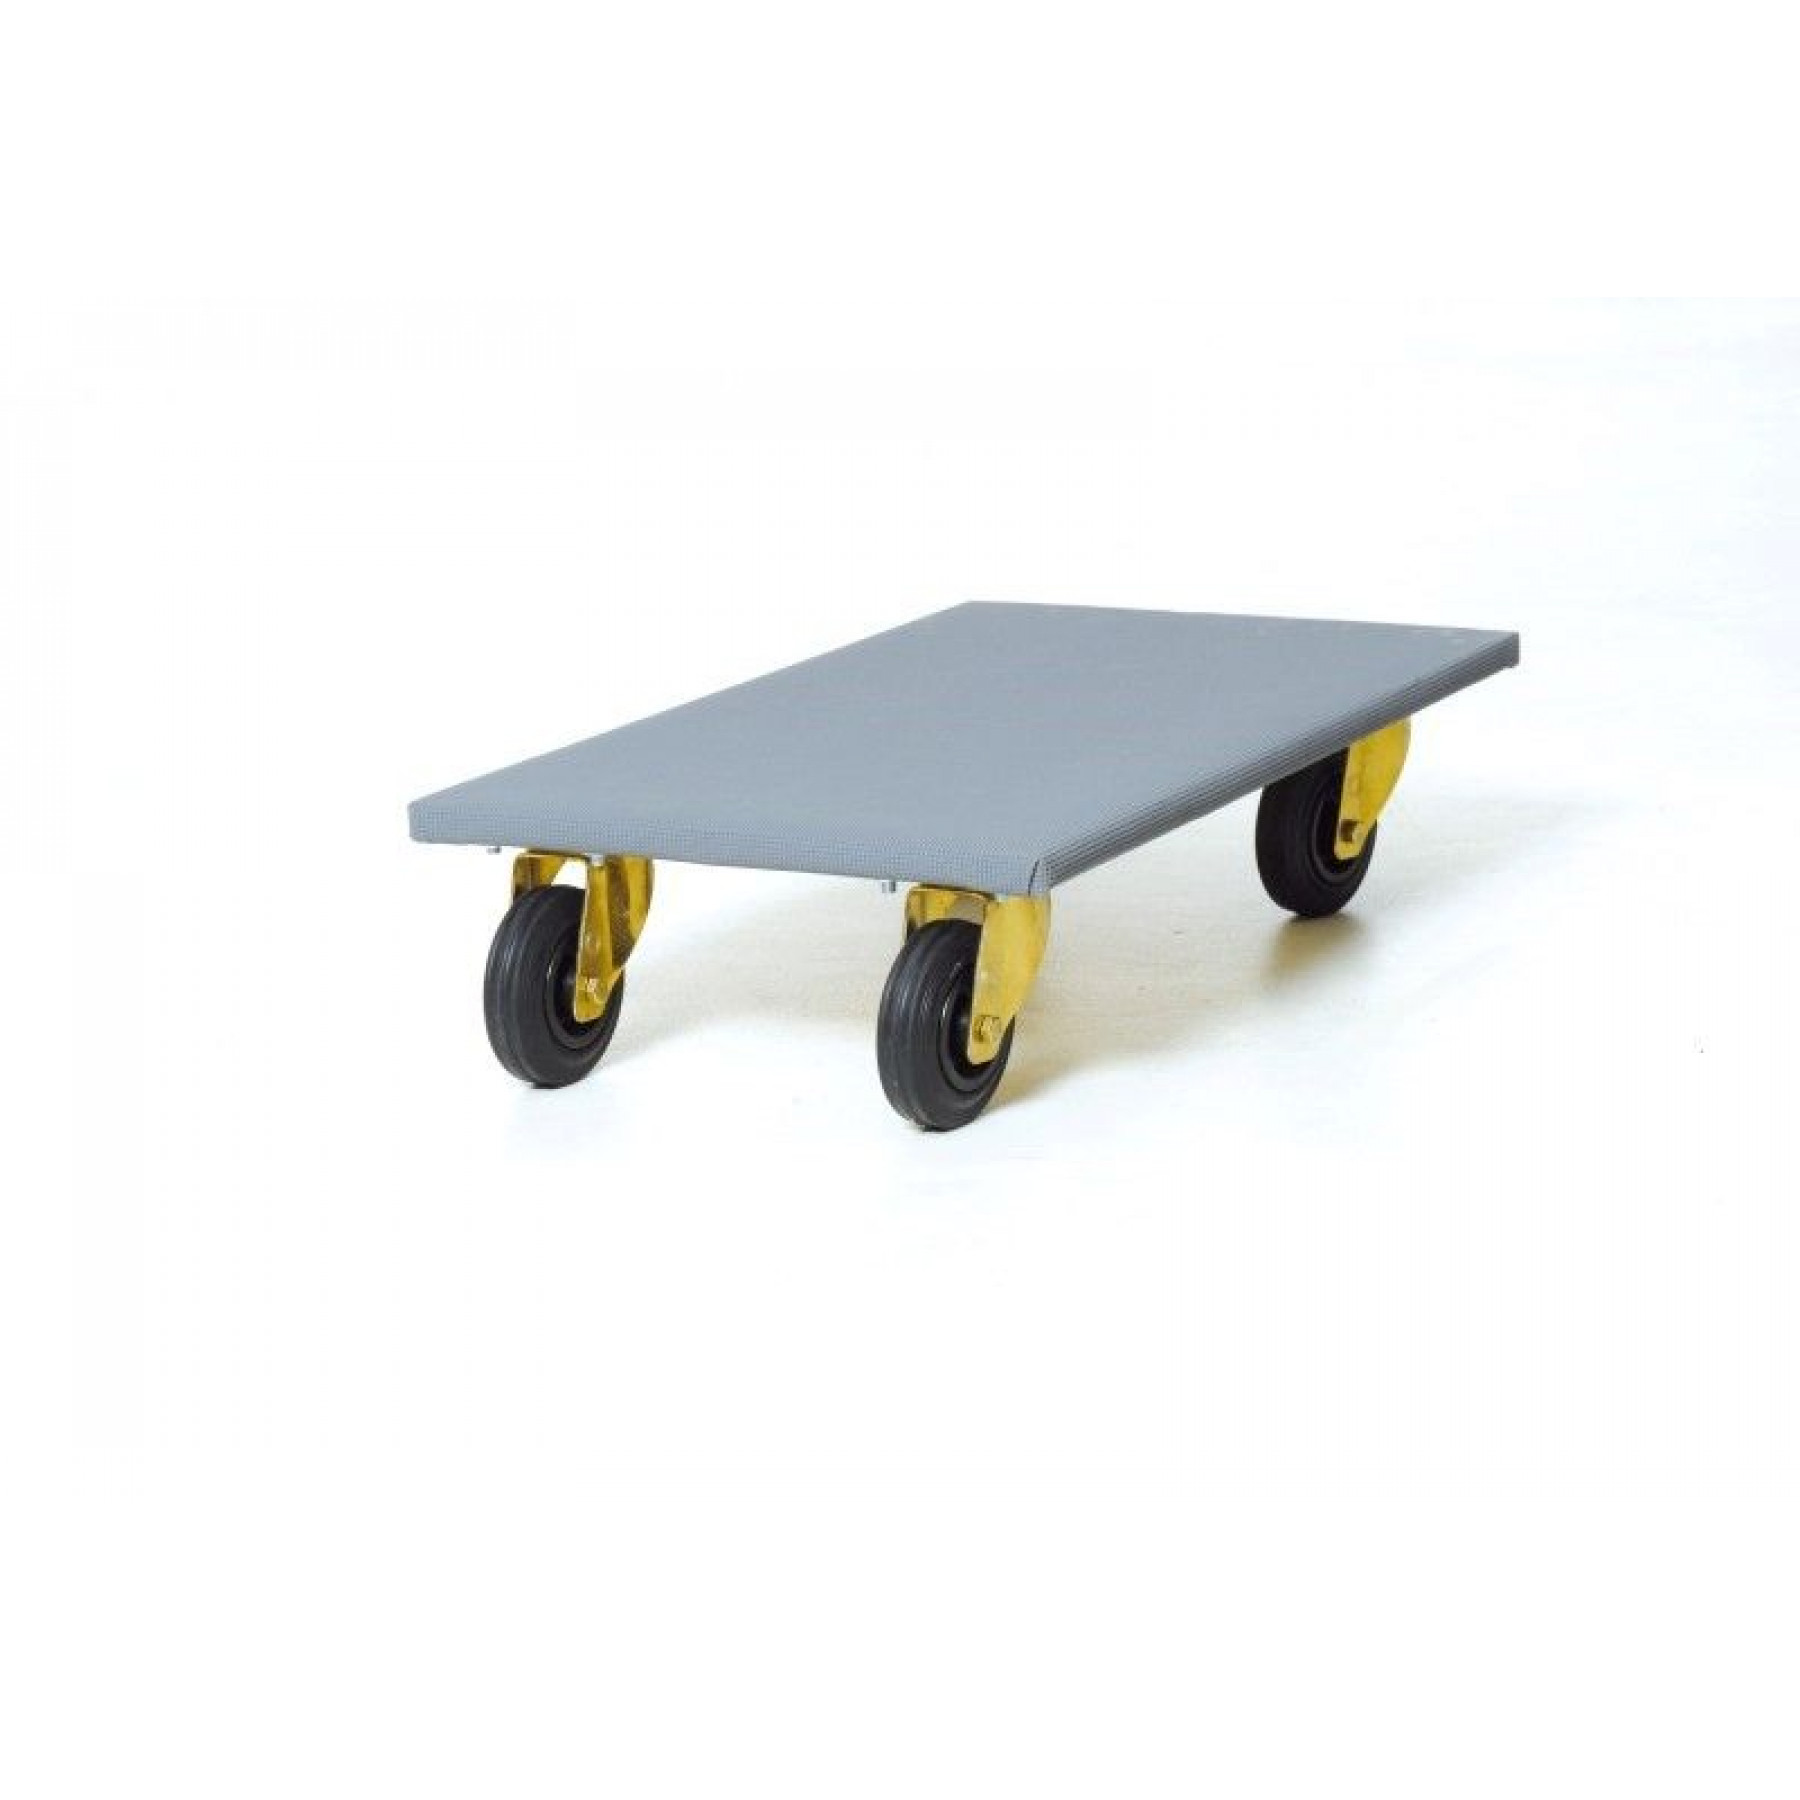 Meubelroller 800x600 mm met rubber wielen, 212.779